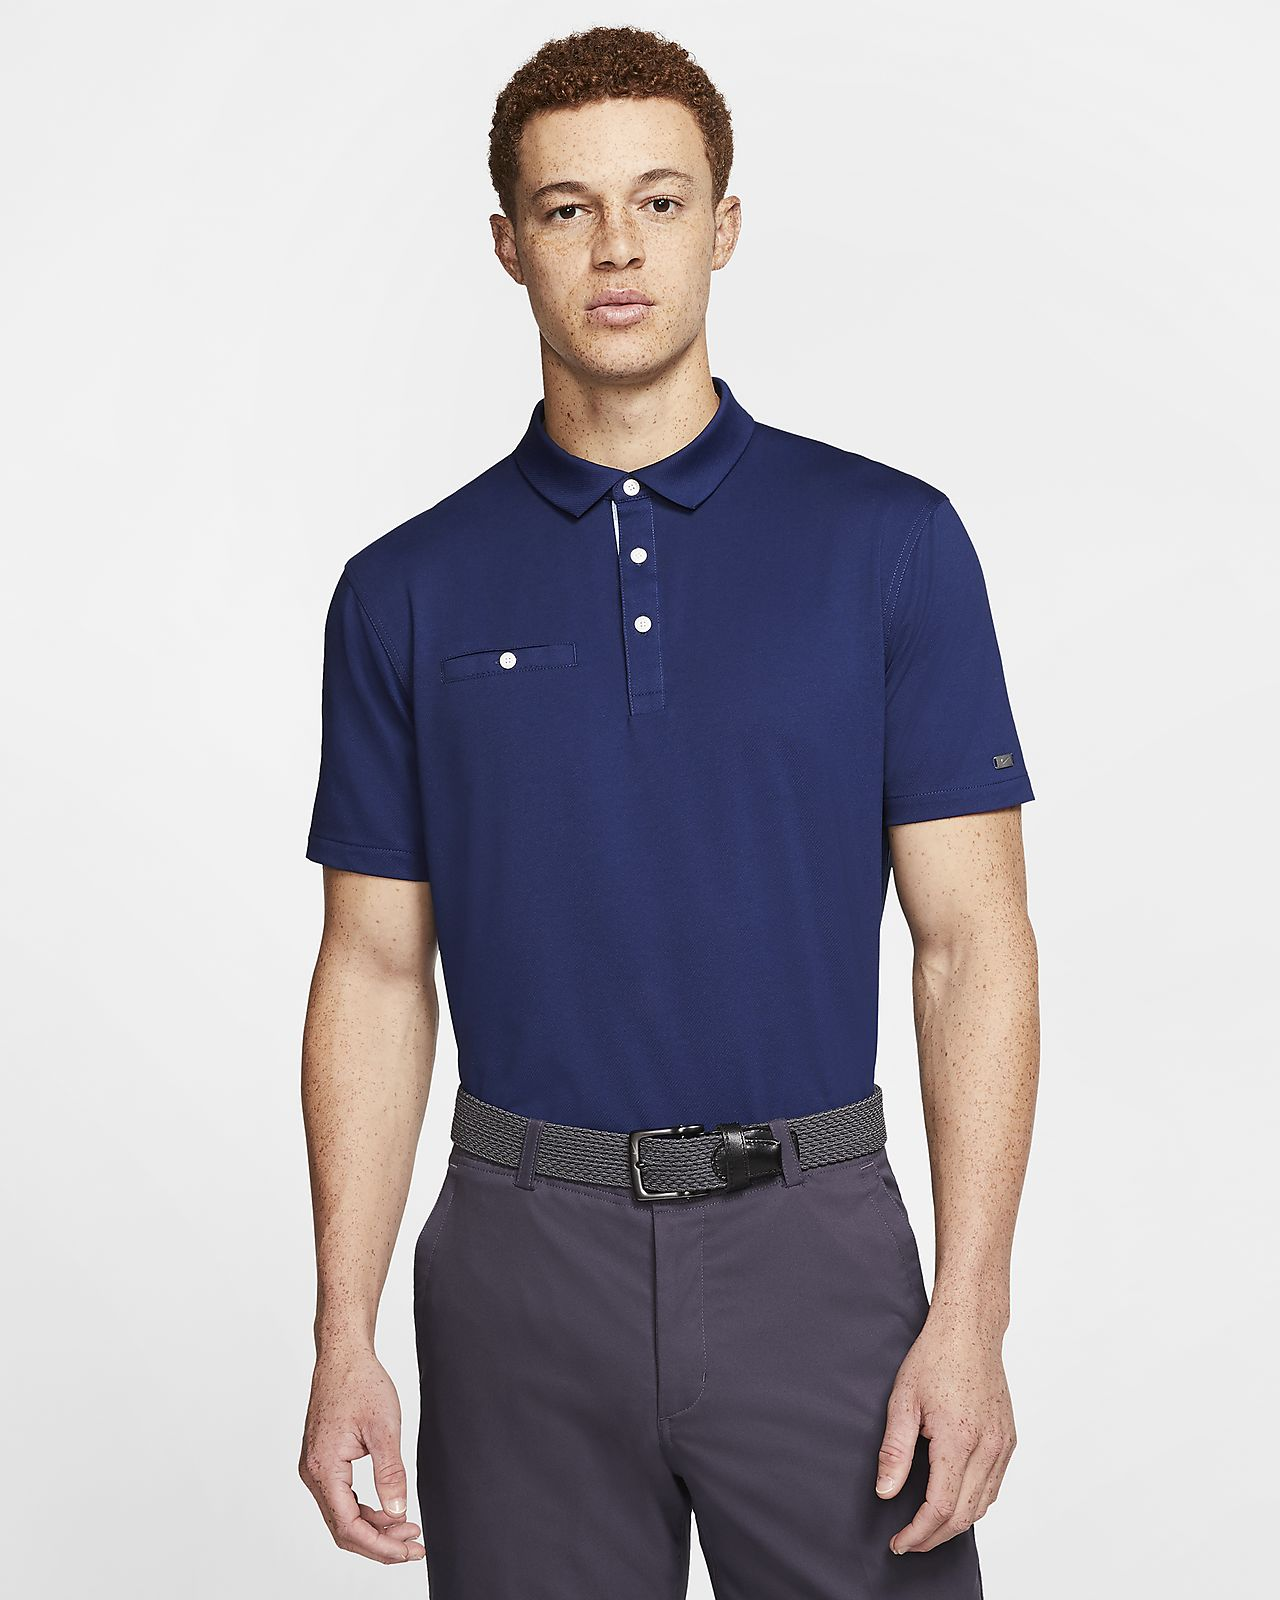 Nike Dri-FIT Player Polo de golf - Home